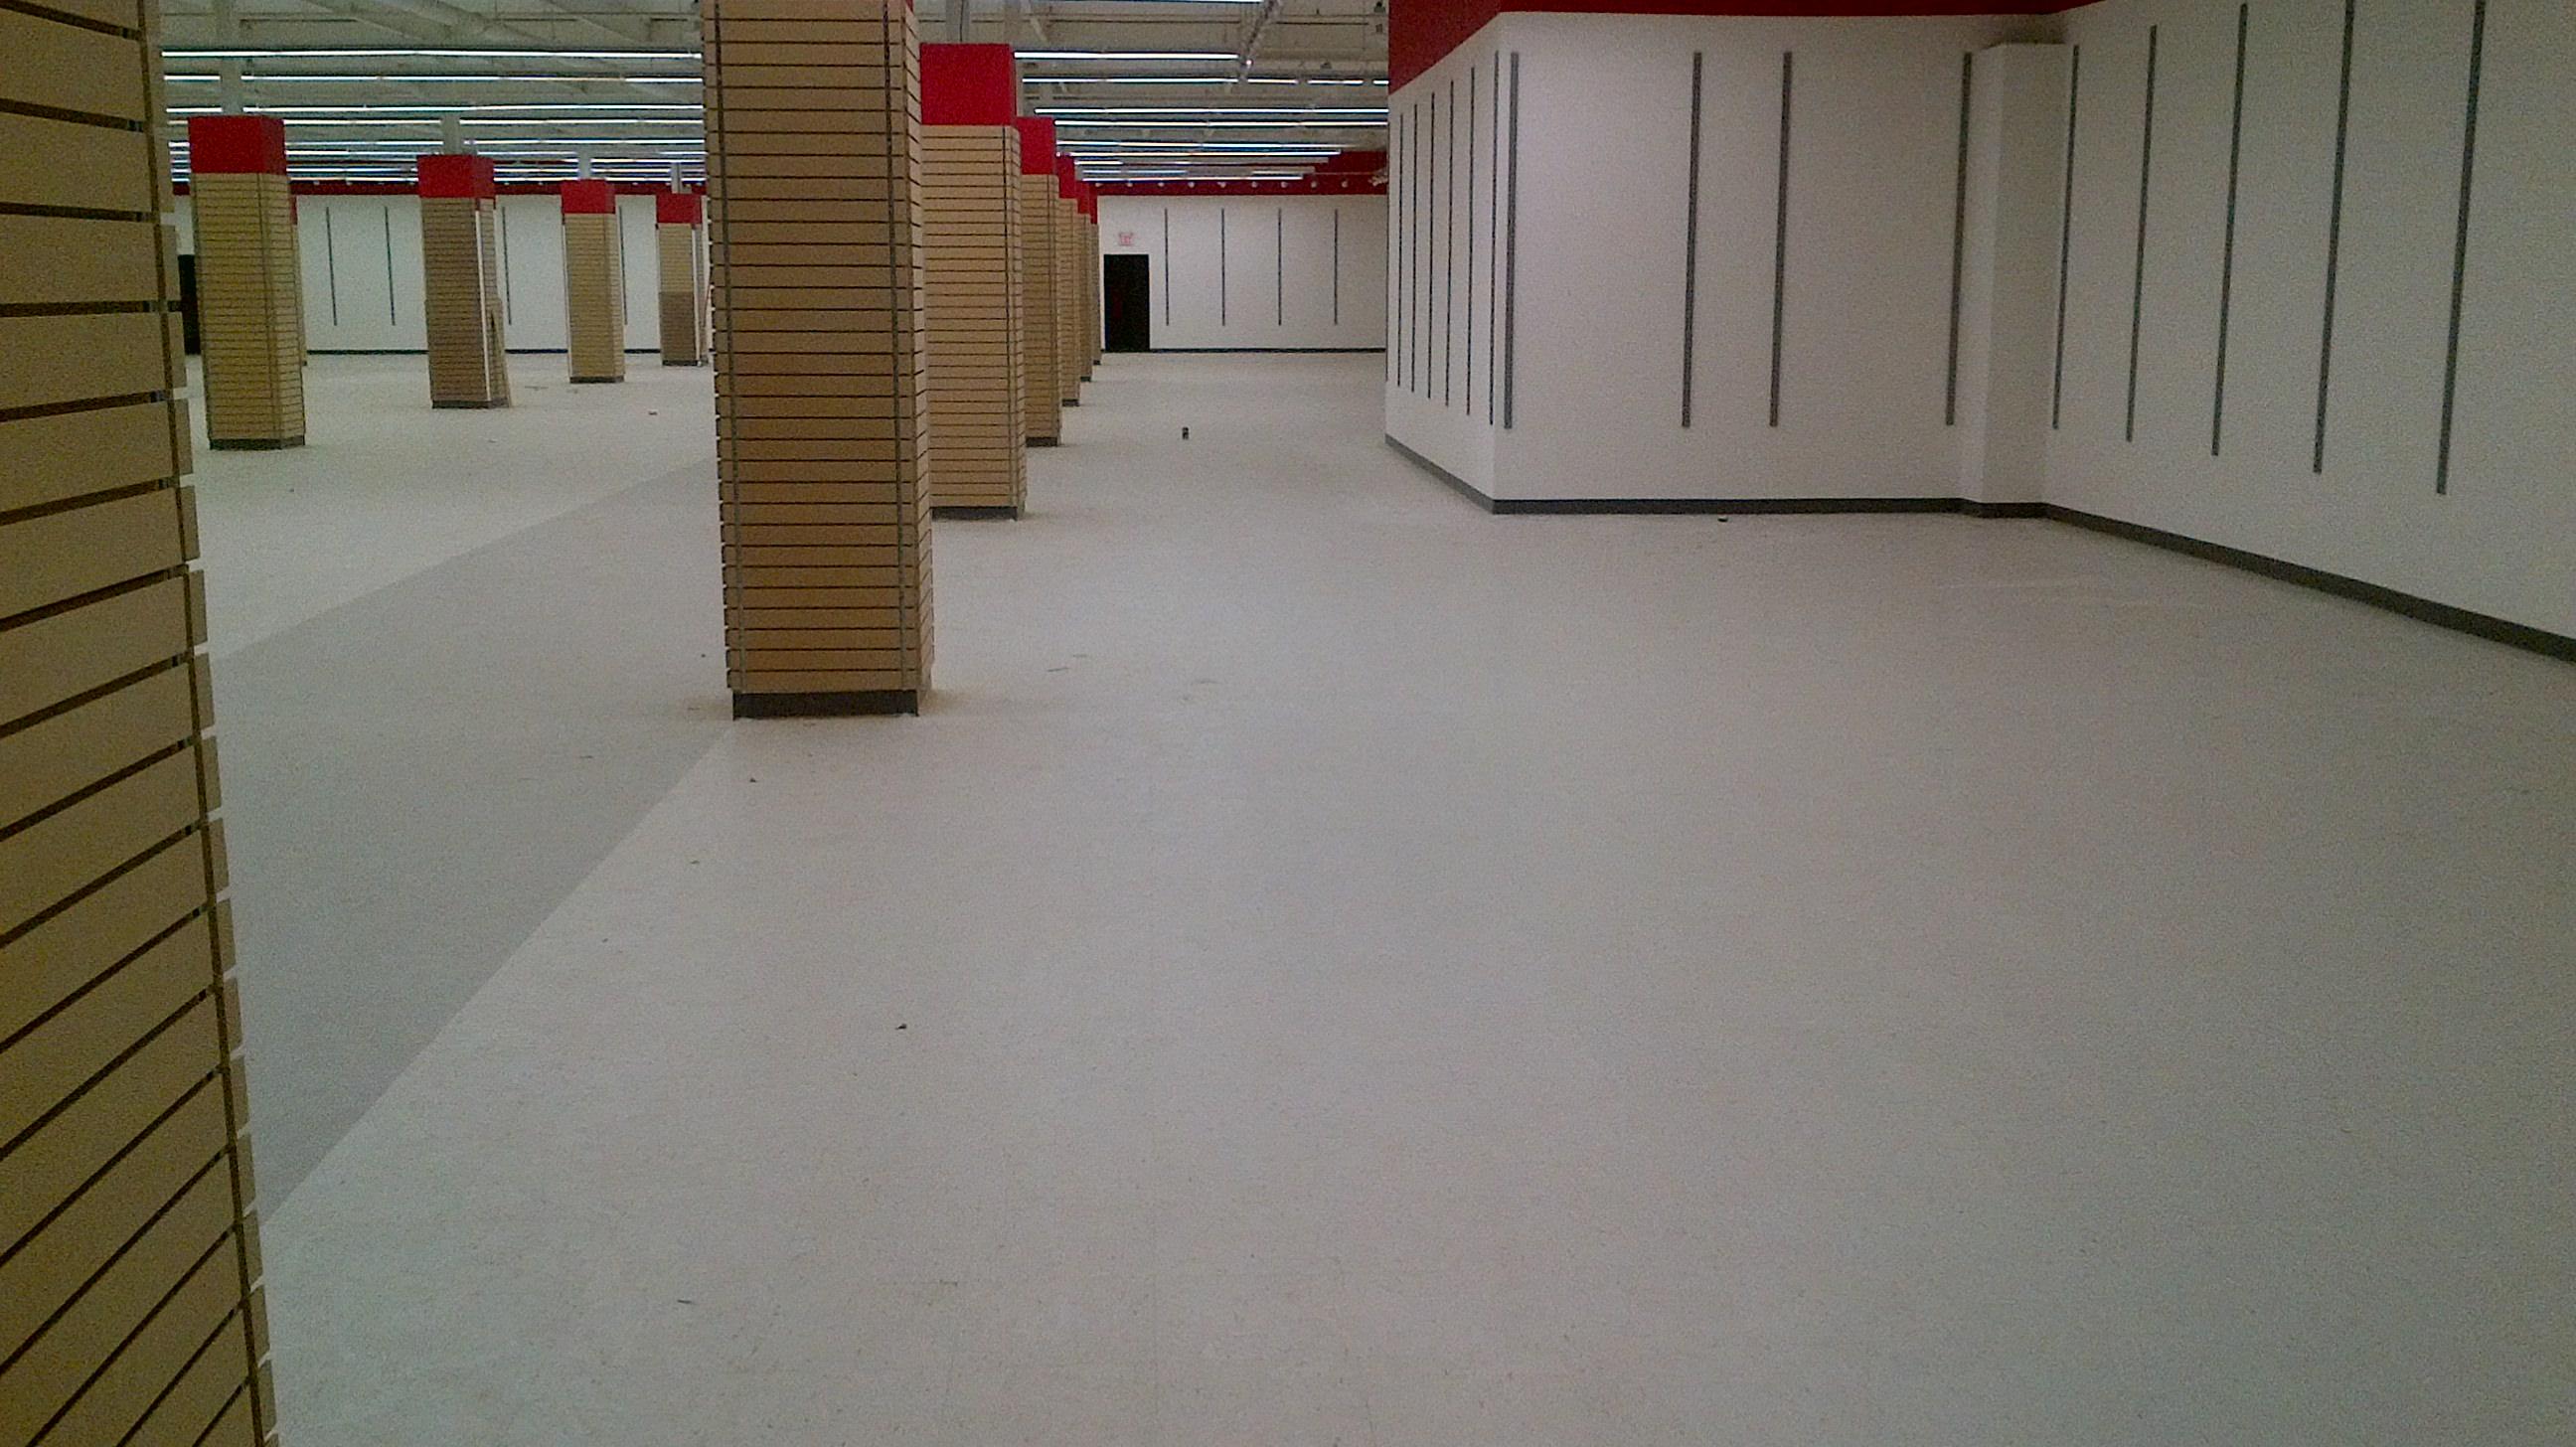 Floor stripped